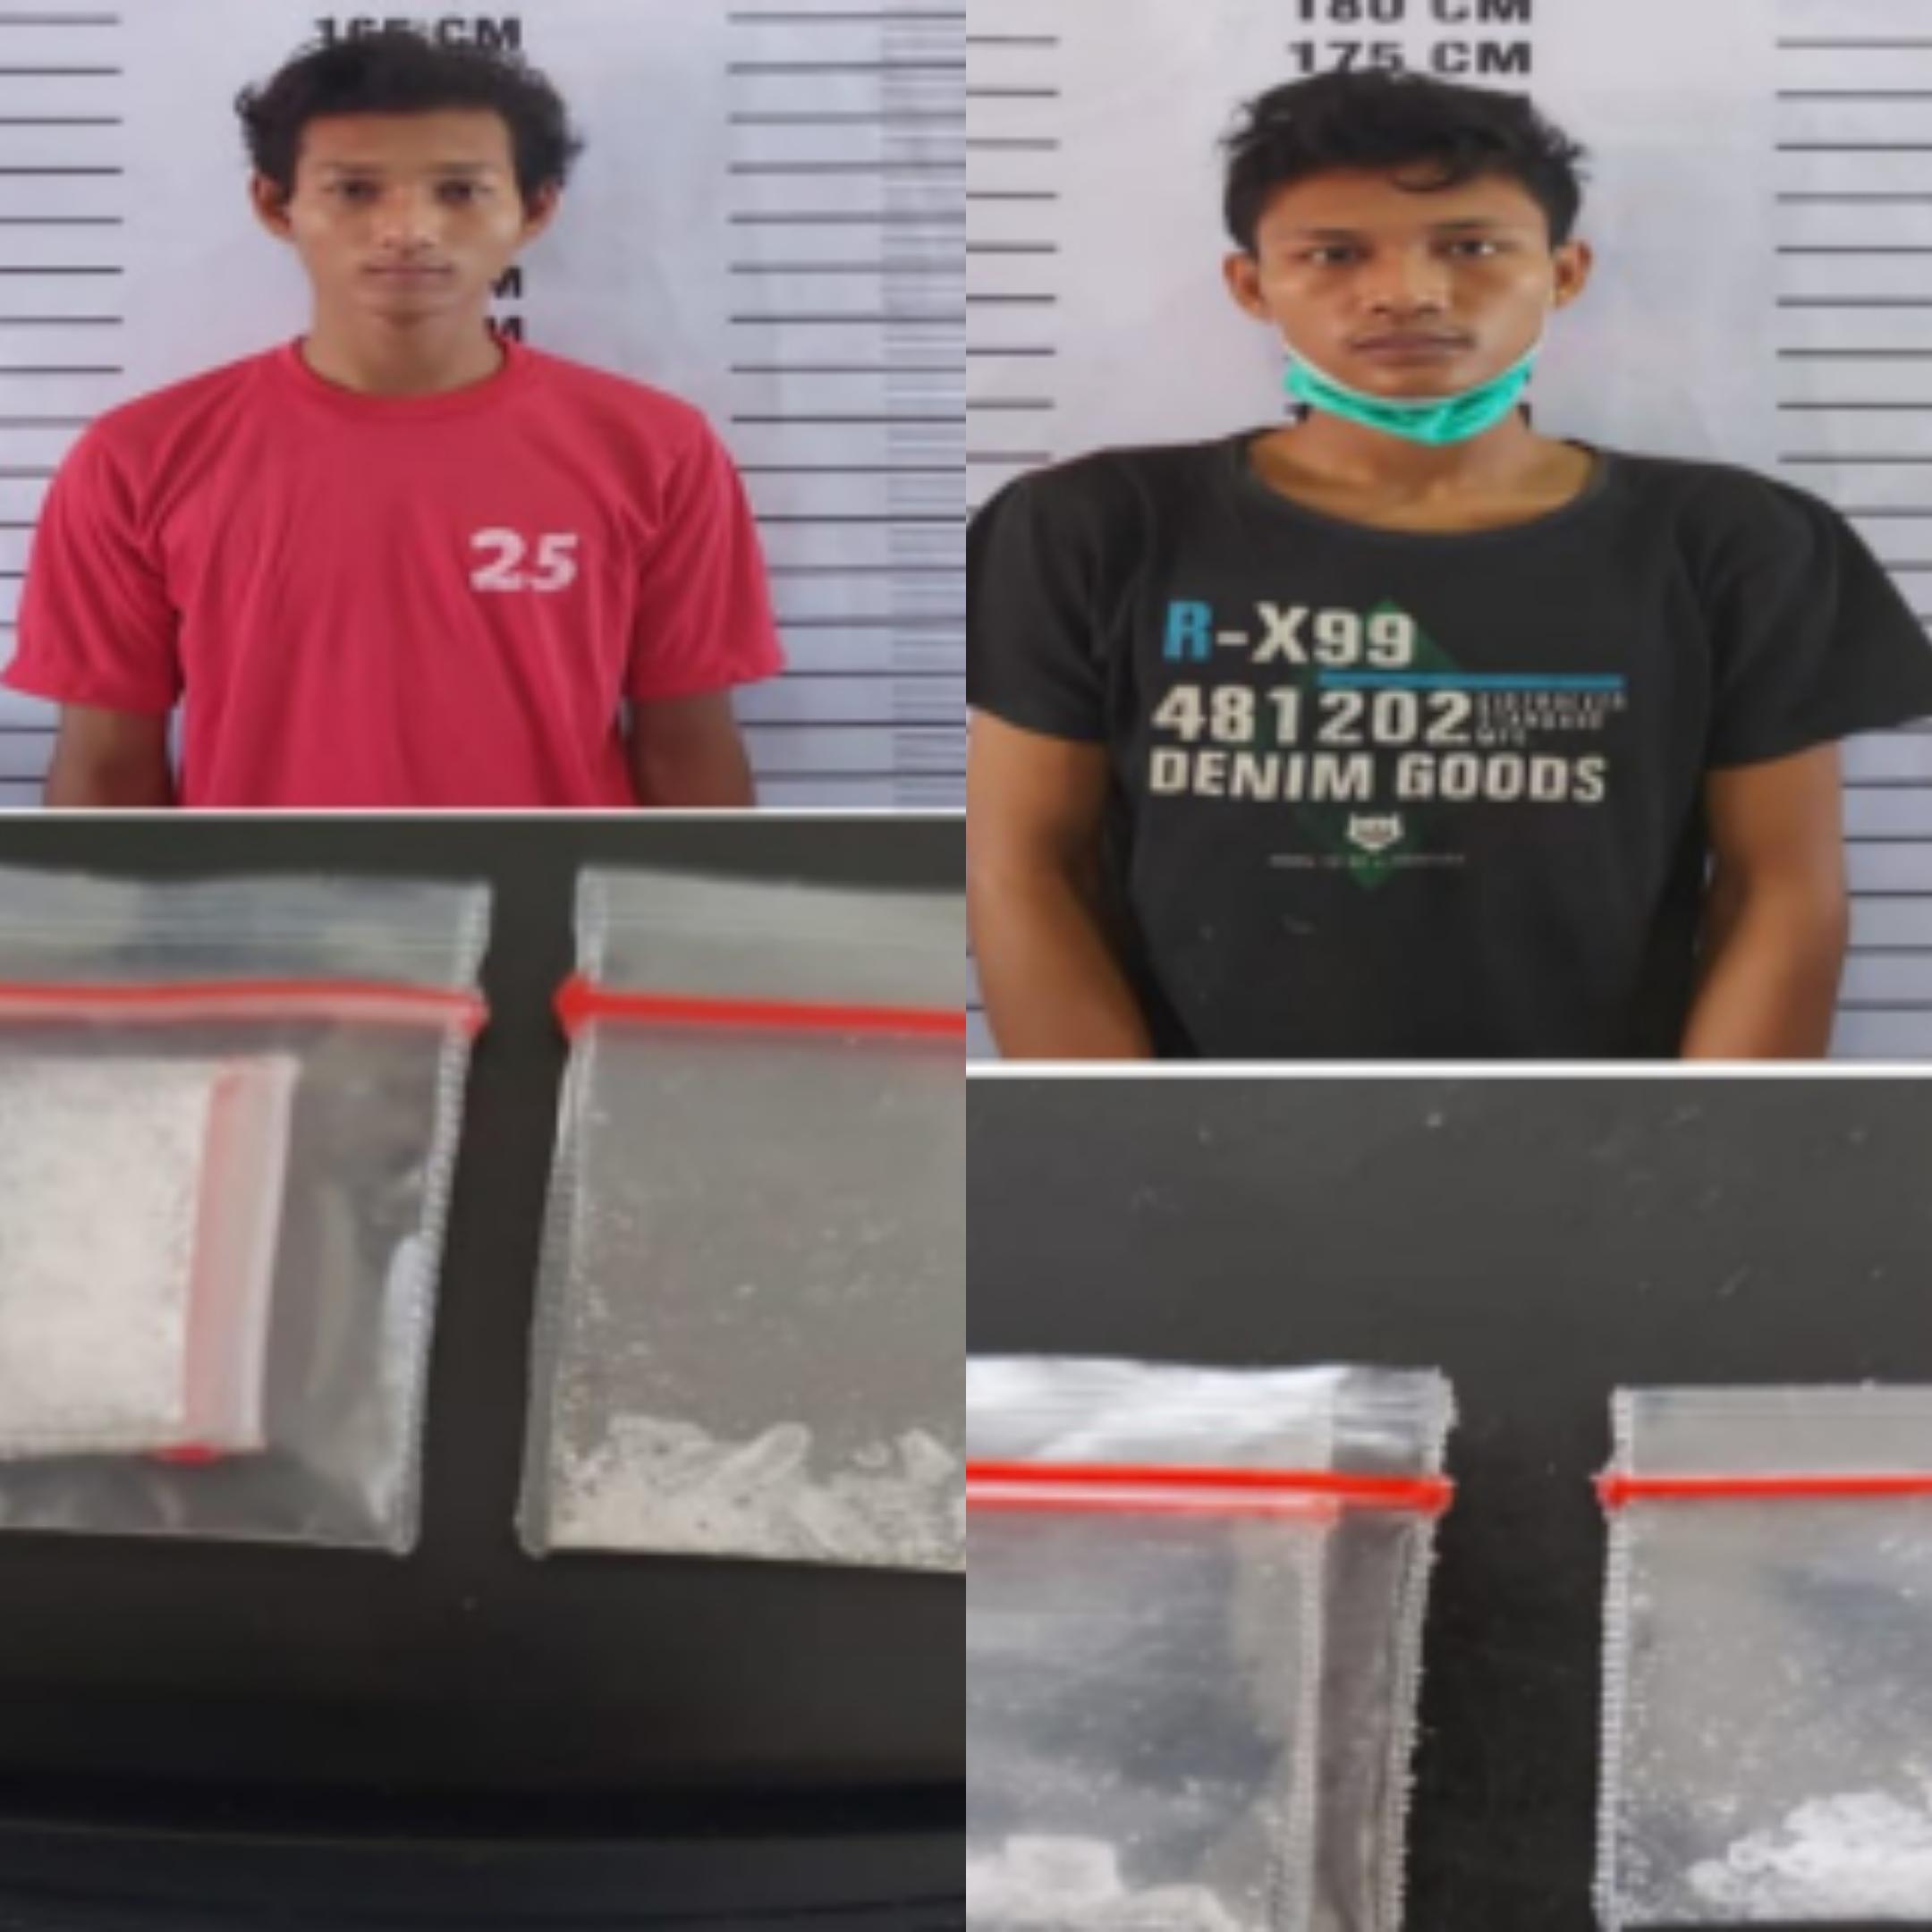 Jual Sabu ke Polisi, Dua Pengedar Narkoba Lubuklinggau Ditangkap